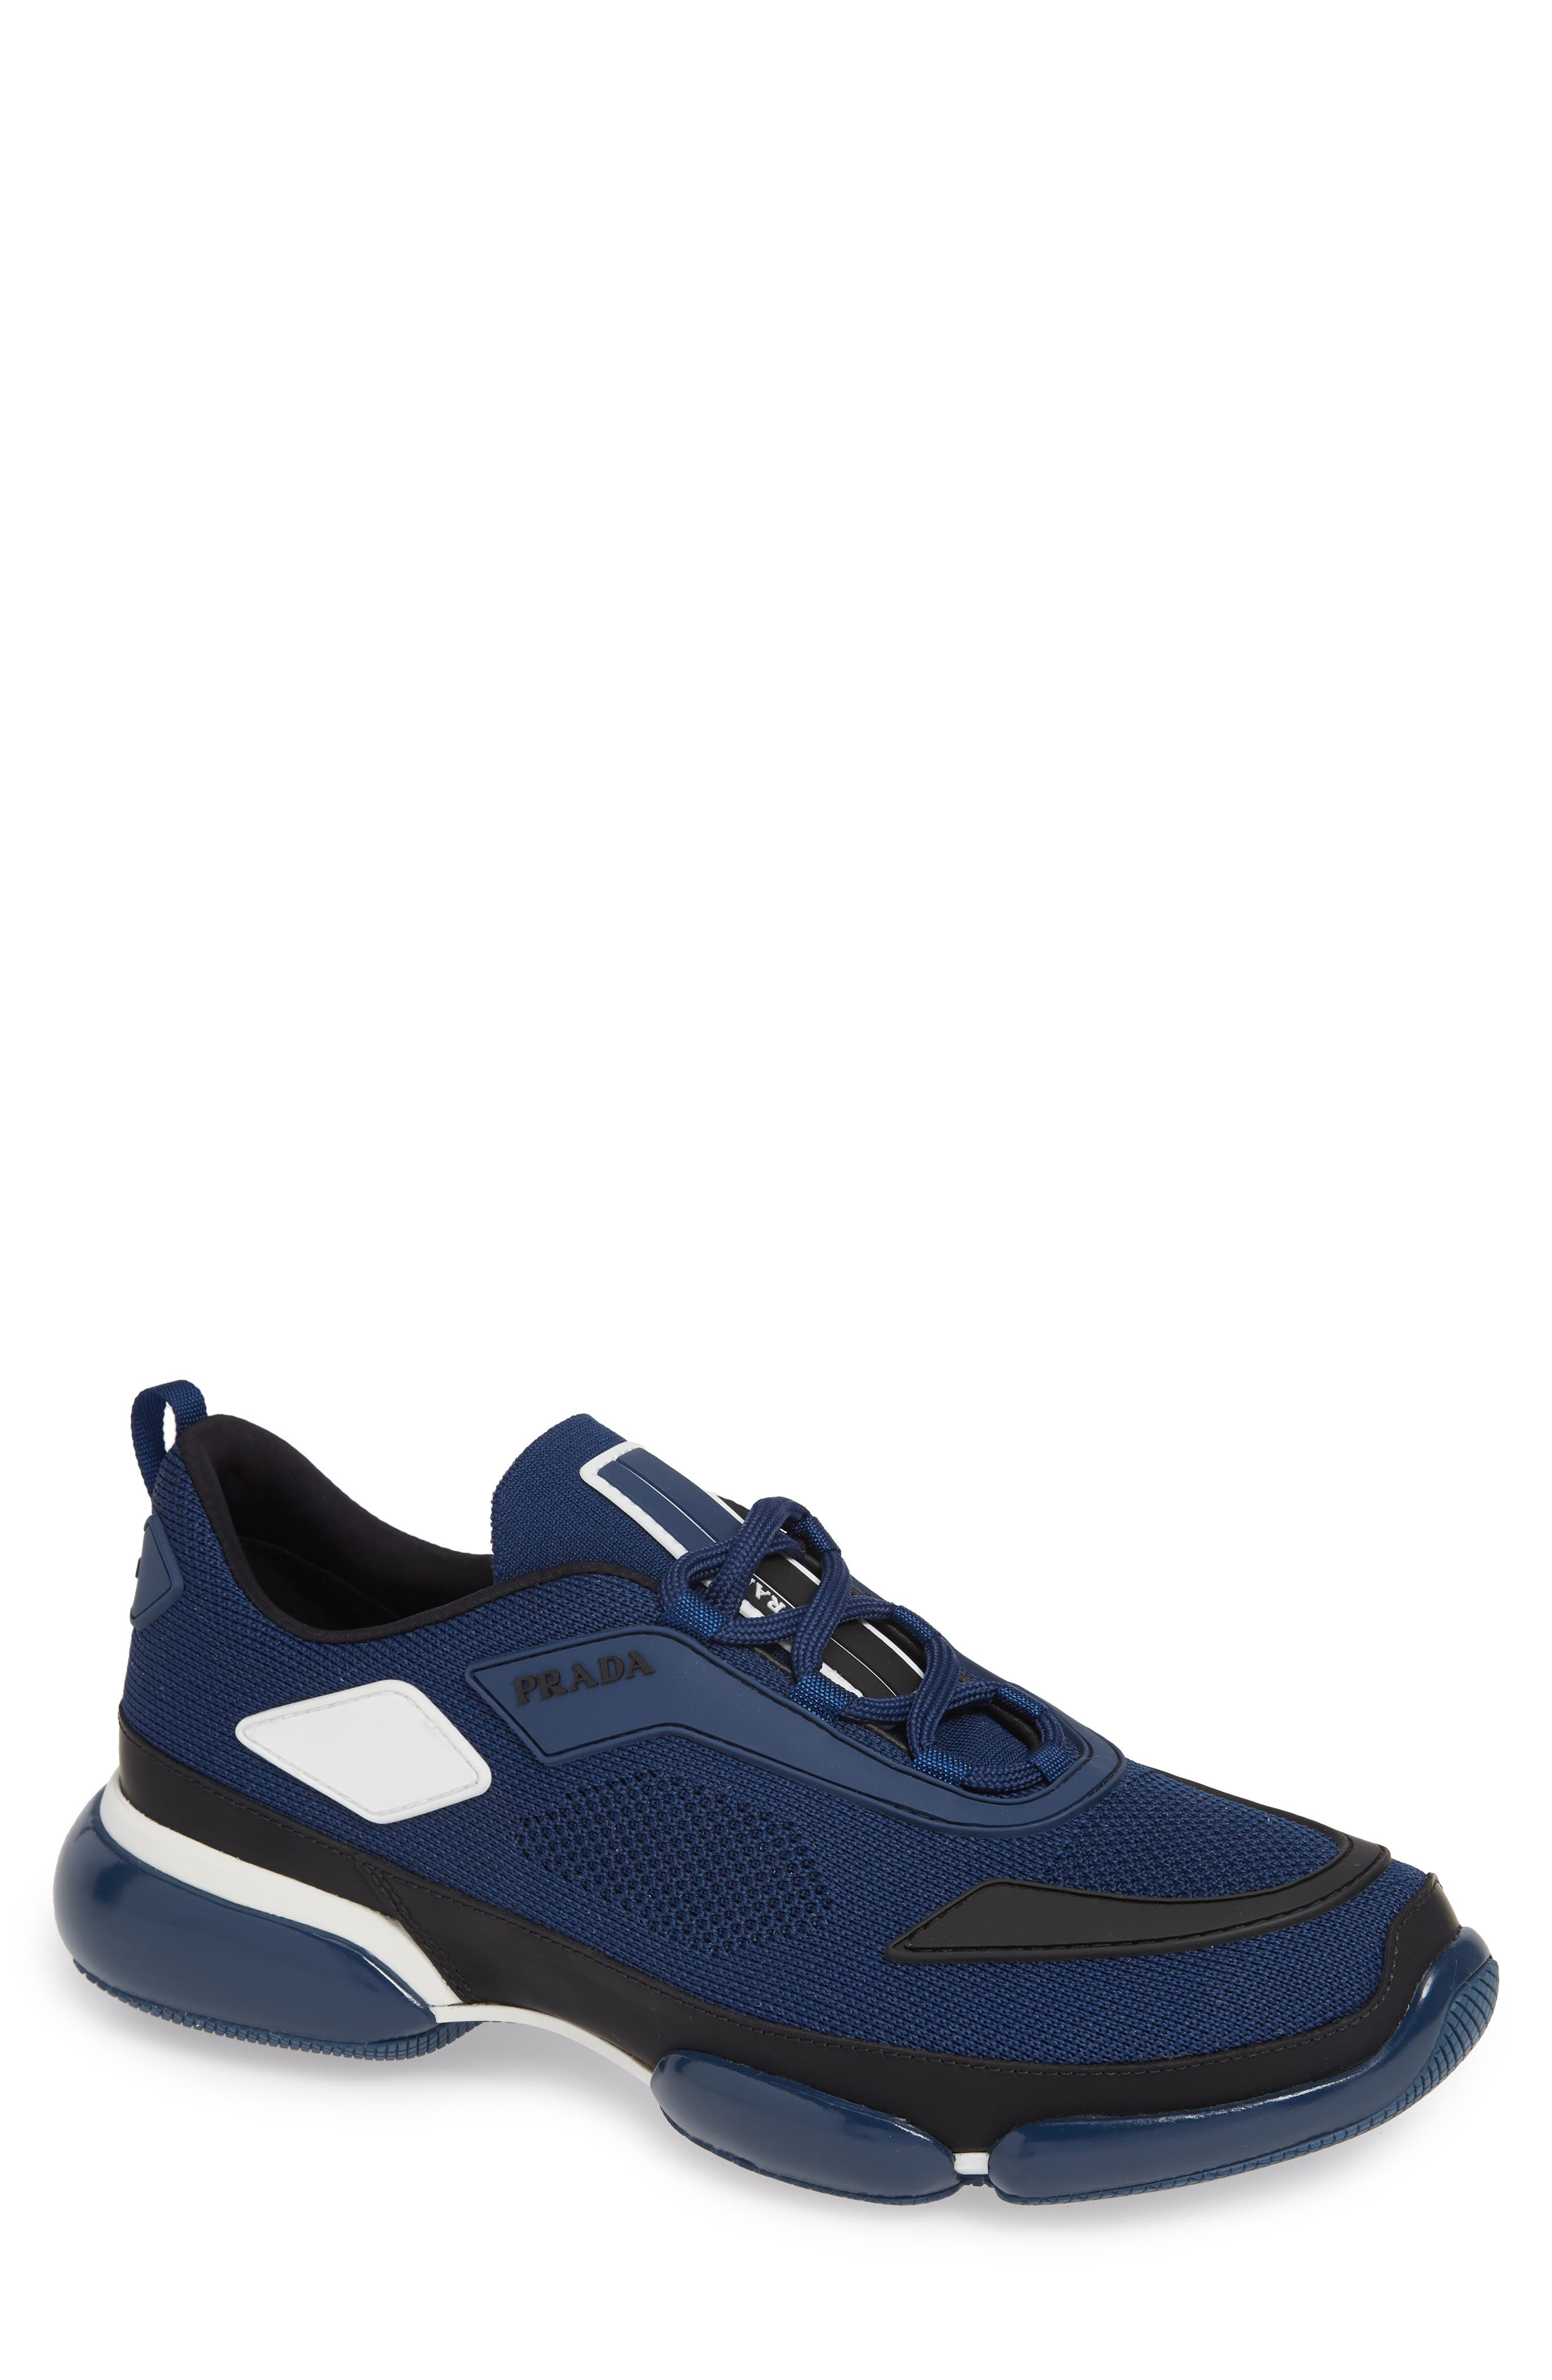 Prada Cloudbust Sneaker (Men) | Nordstrom